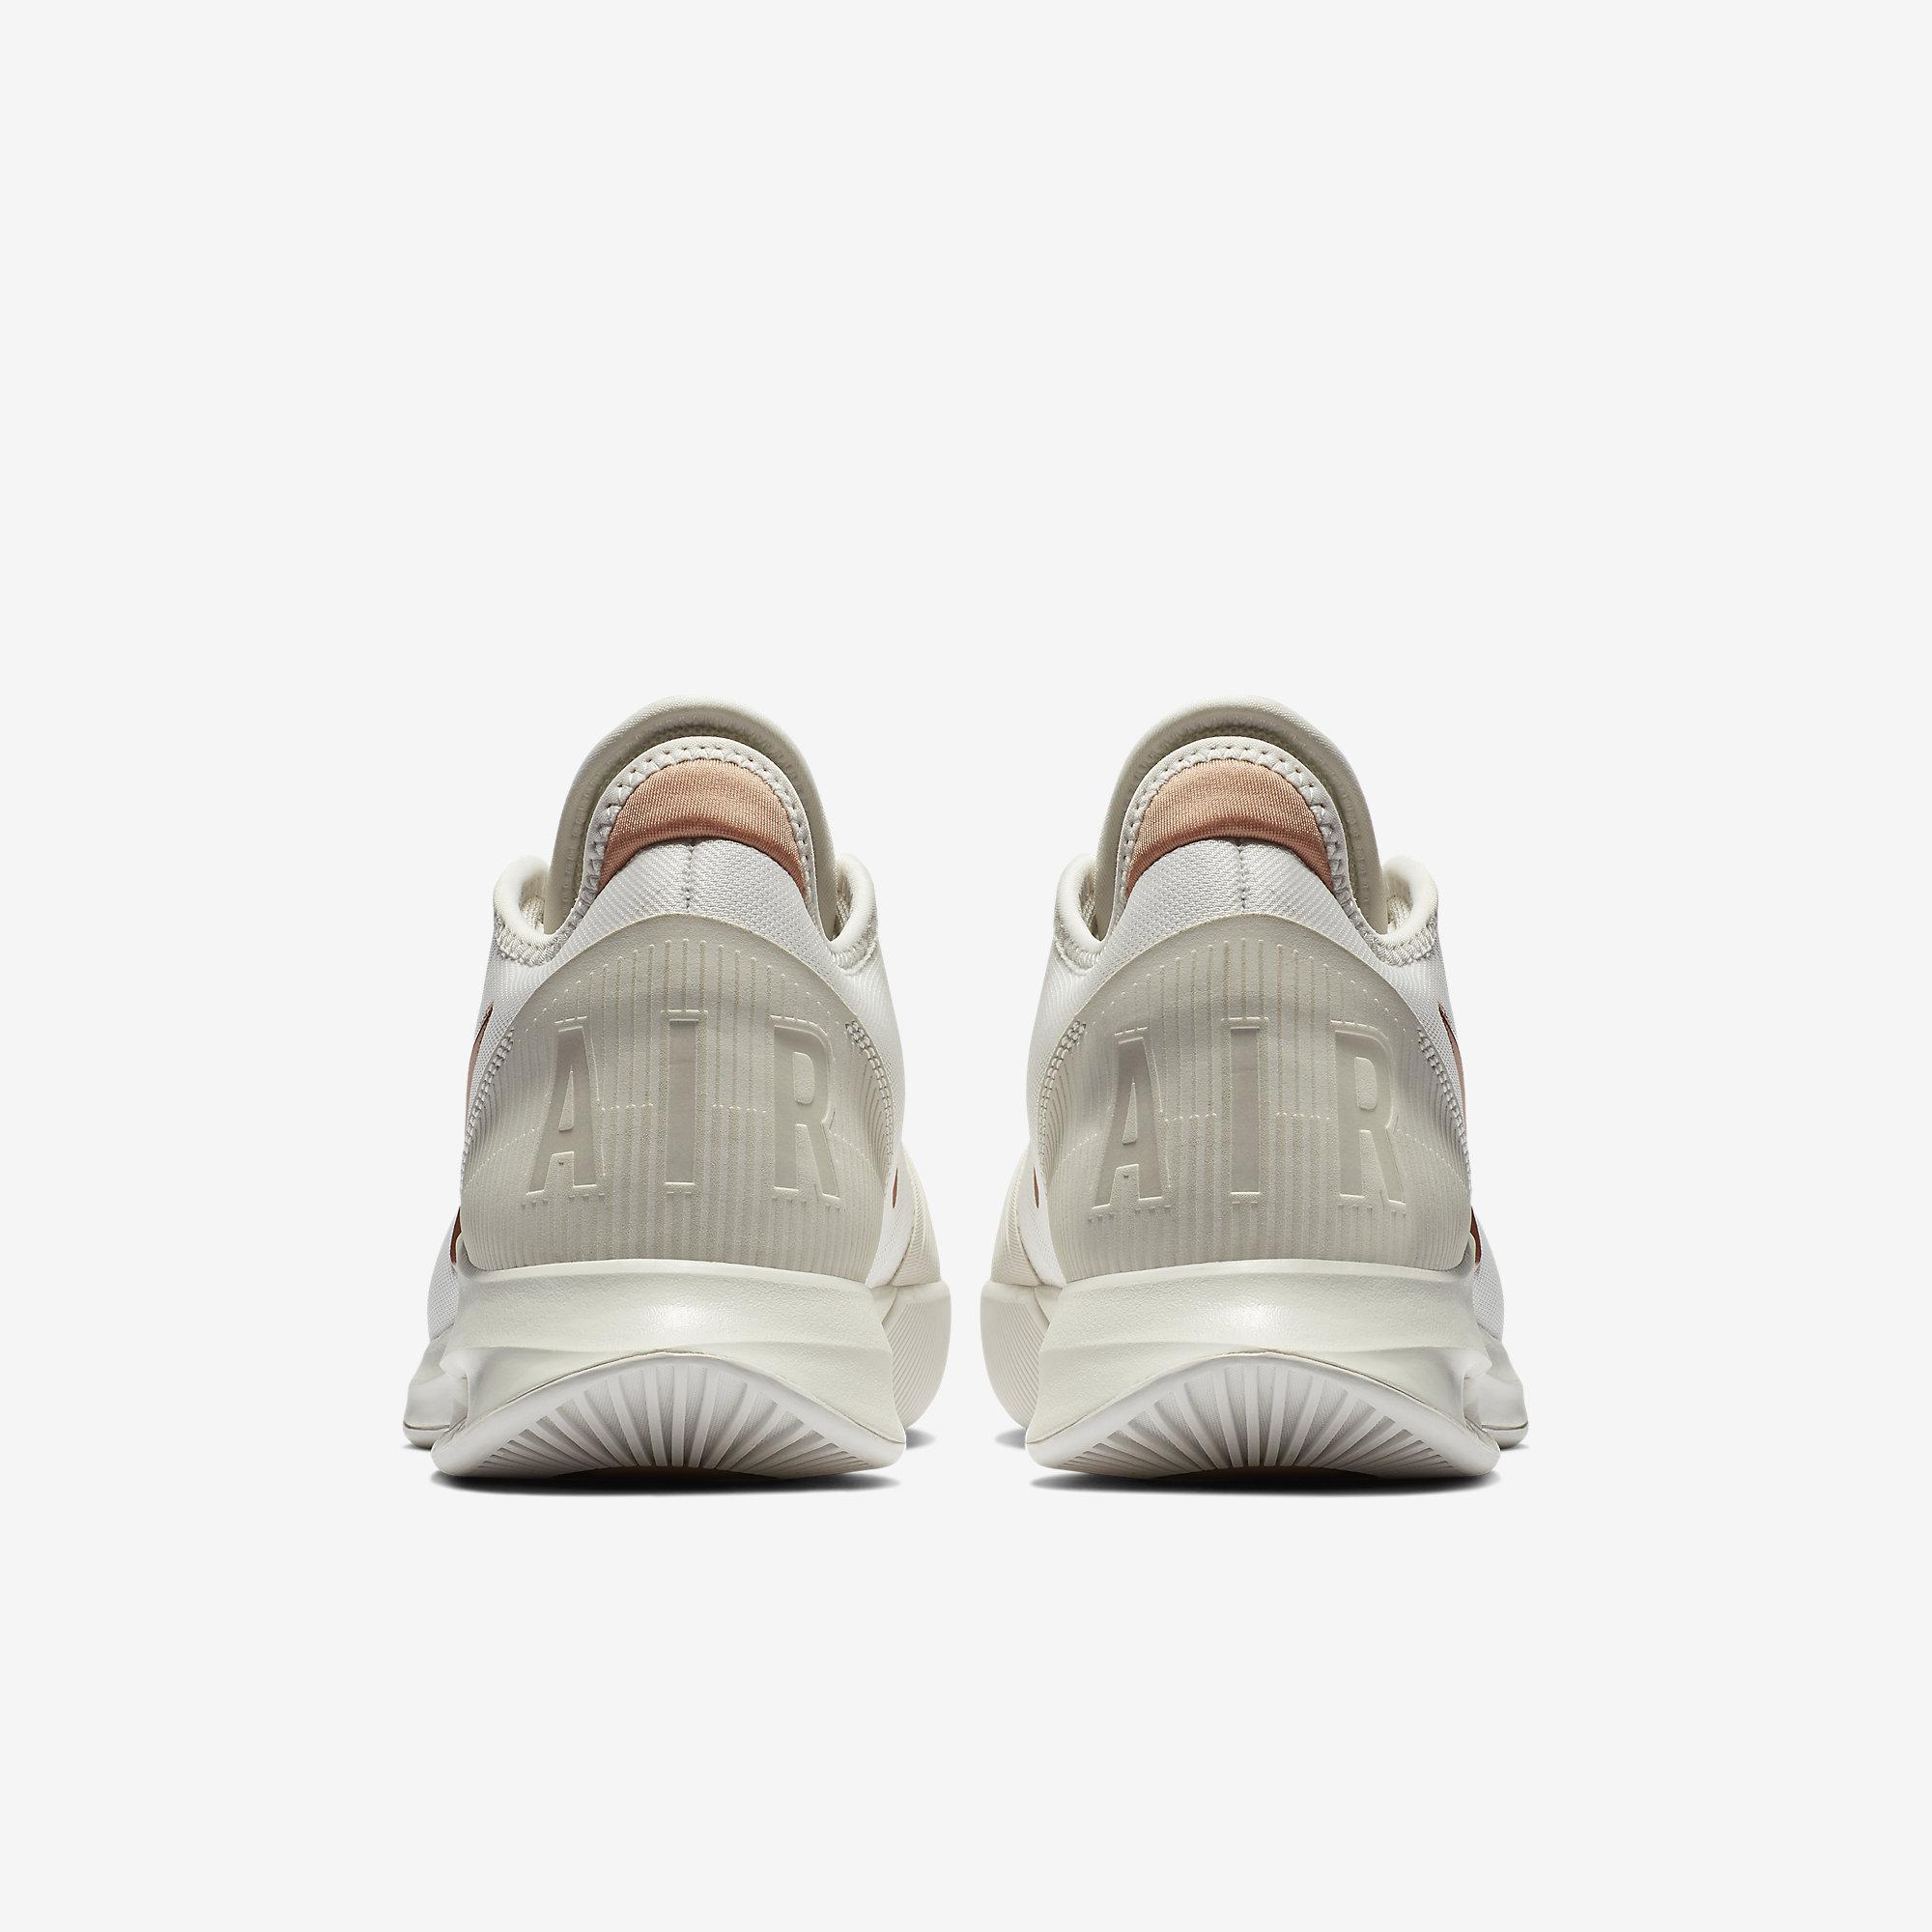 d770dacaaaf Nike Womens Air Max Wildcard Tennis Shoes - Phantom Rose Gold ...